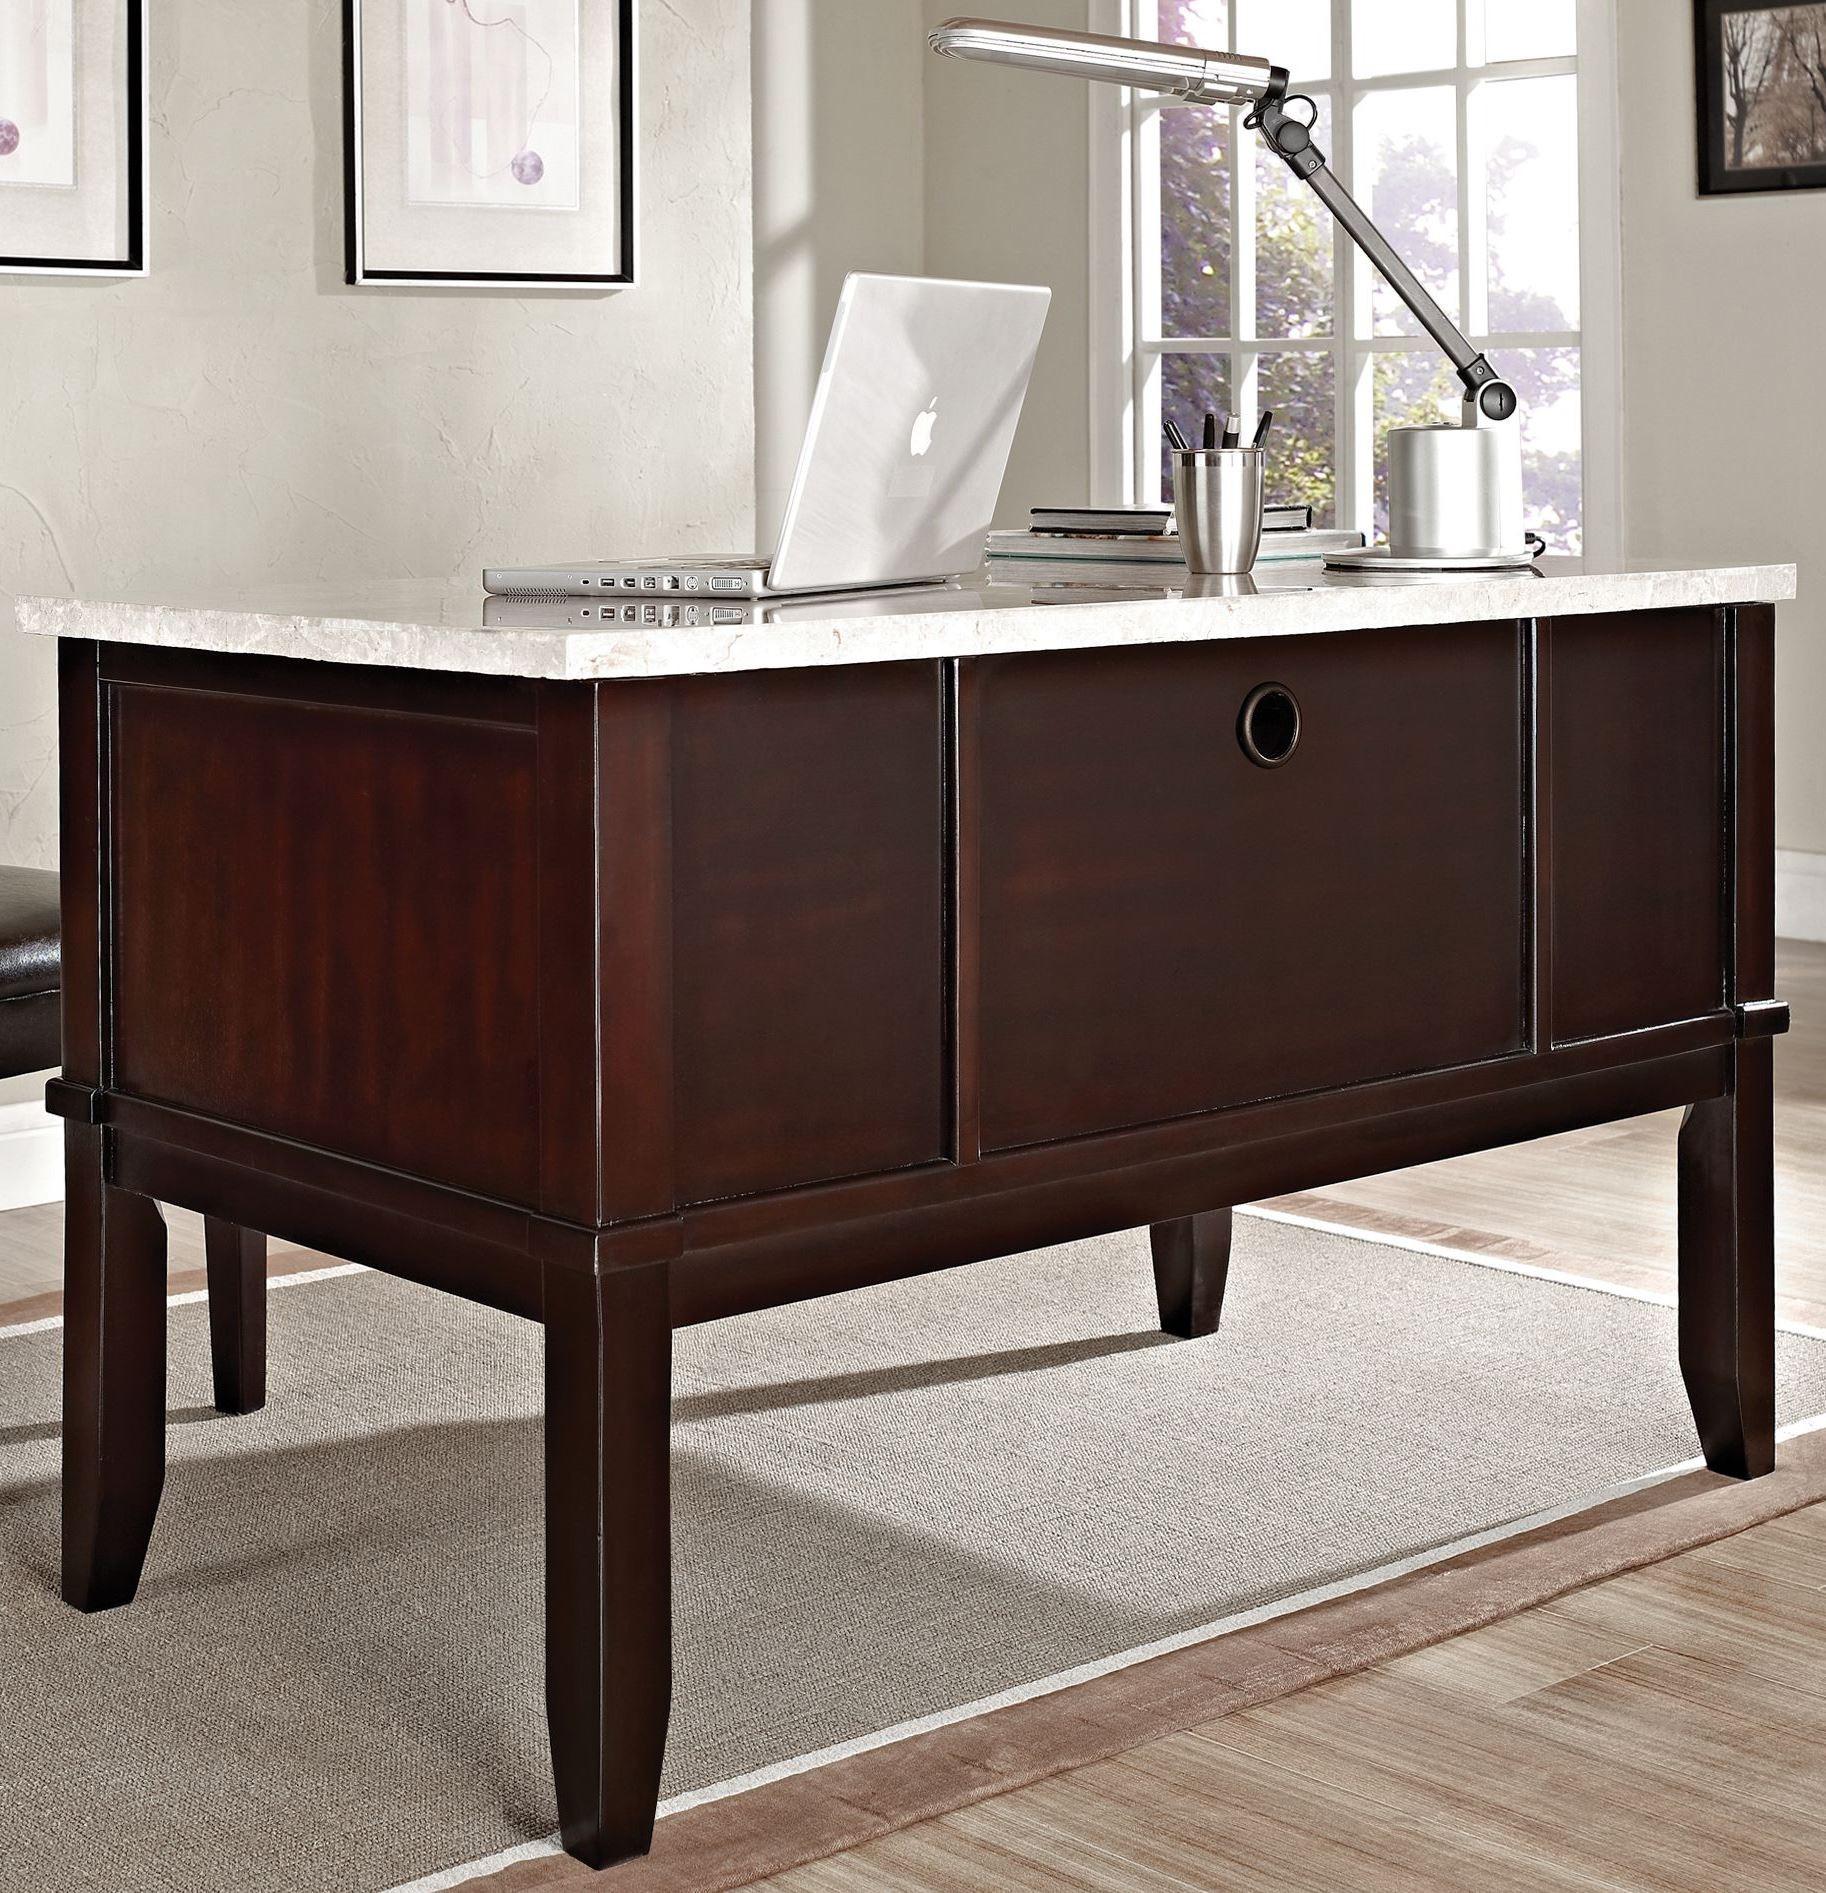 Monarch Dark Cherry Desk from Steve Silver MC150D